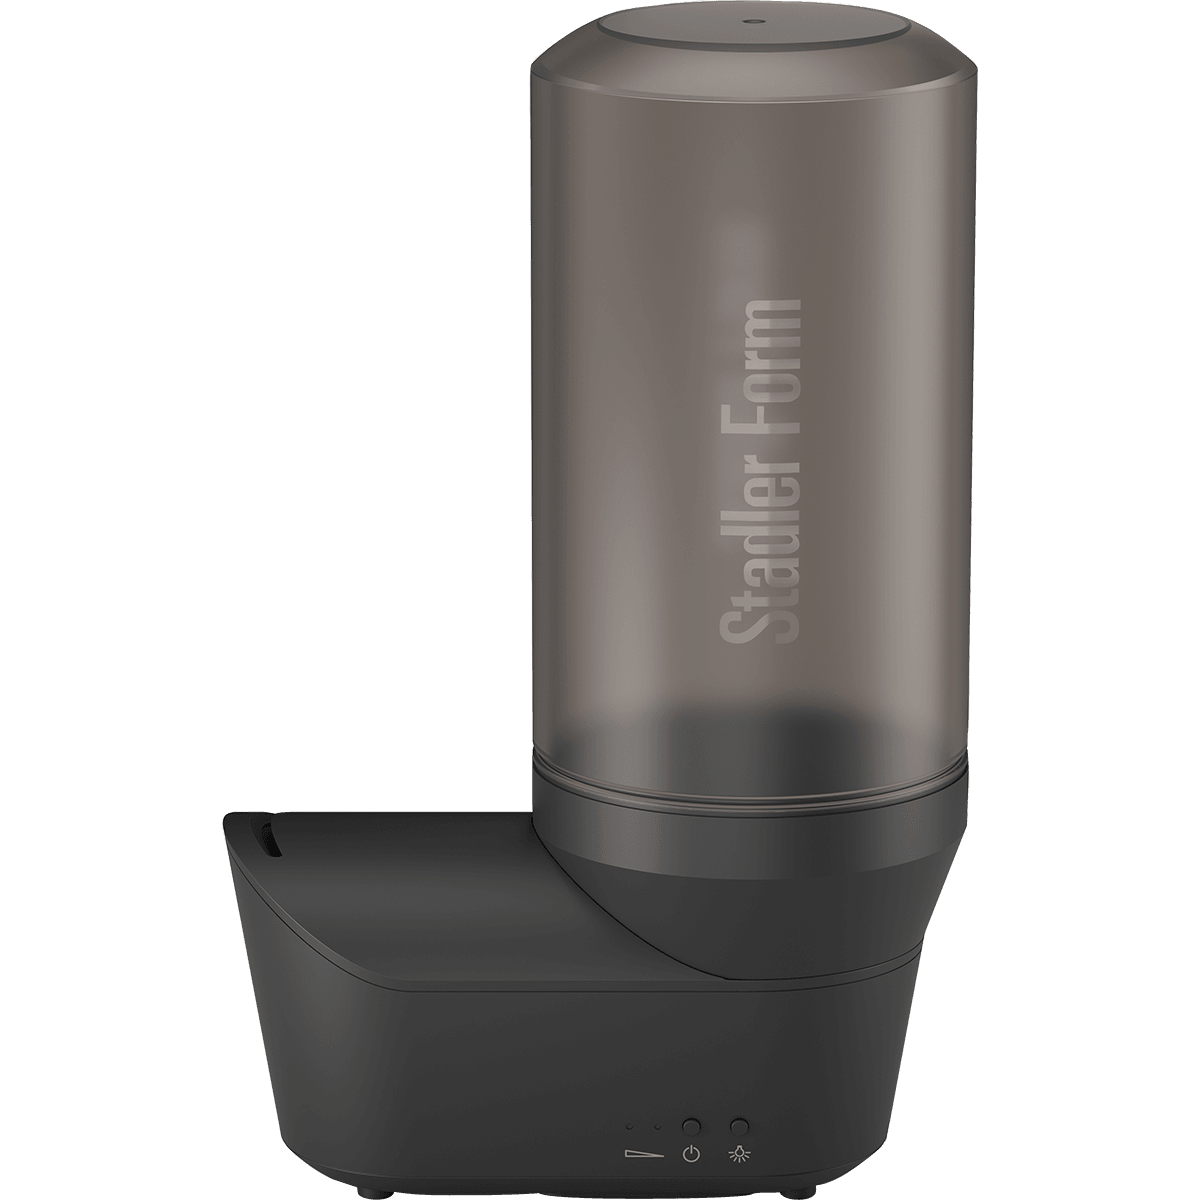 Buy Cheap Stadler Form Emma Personal Humidifier Black